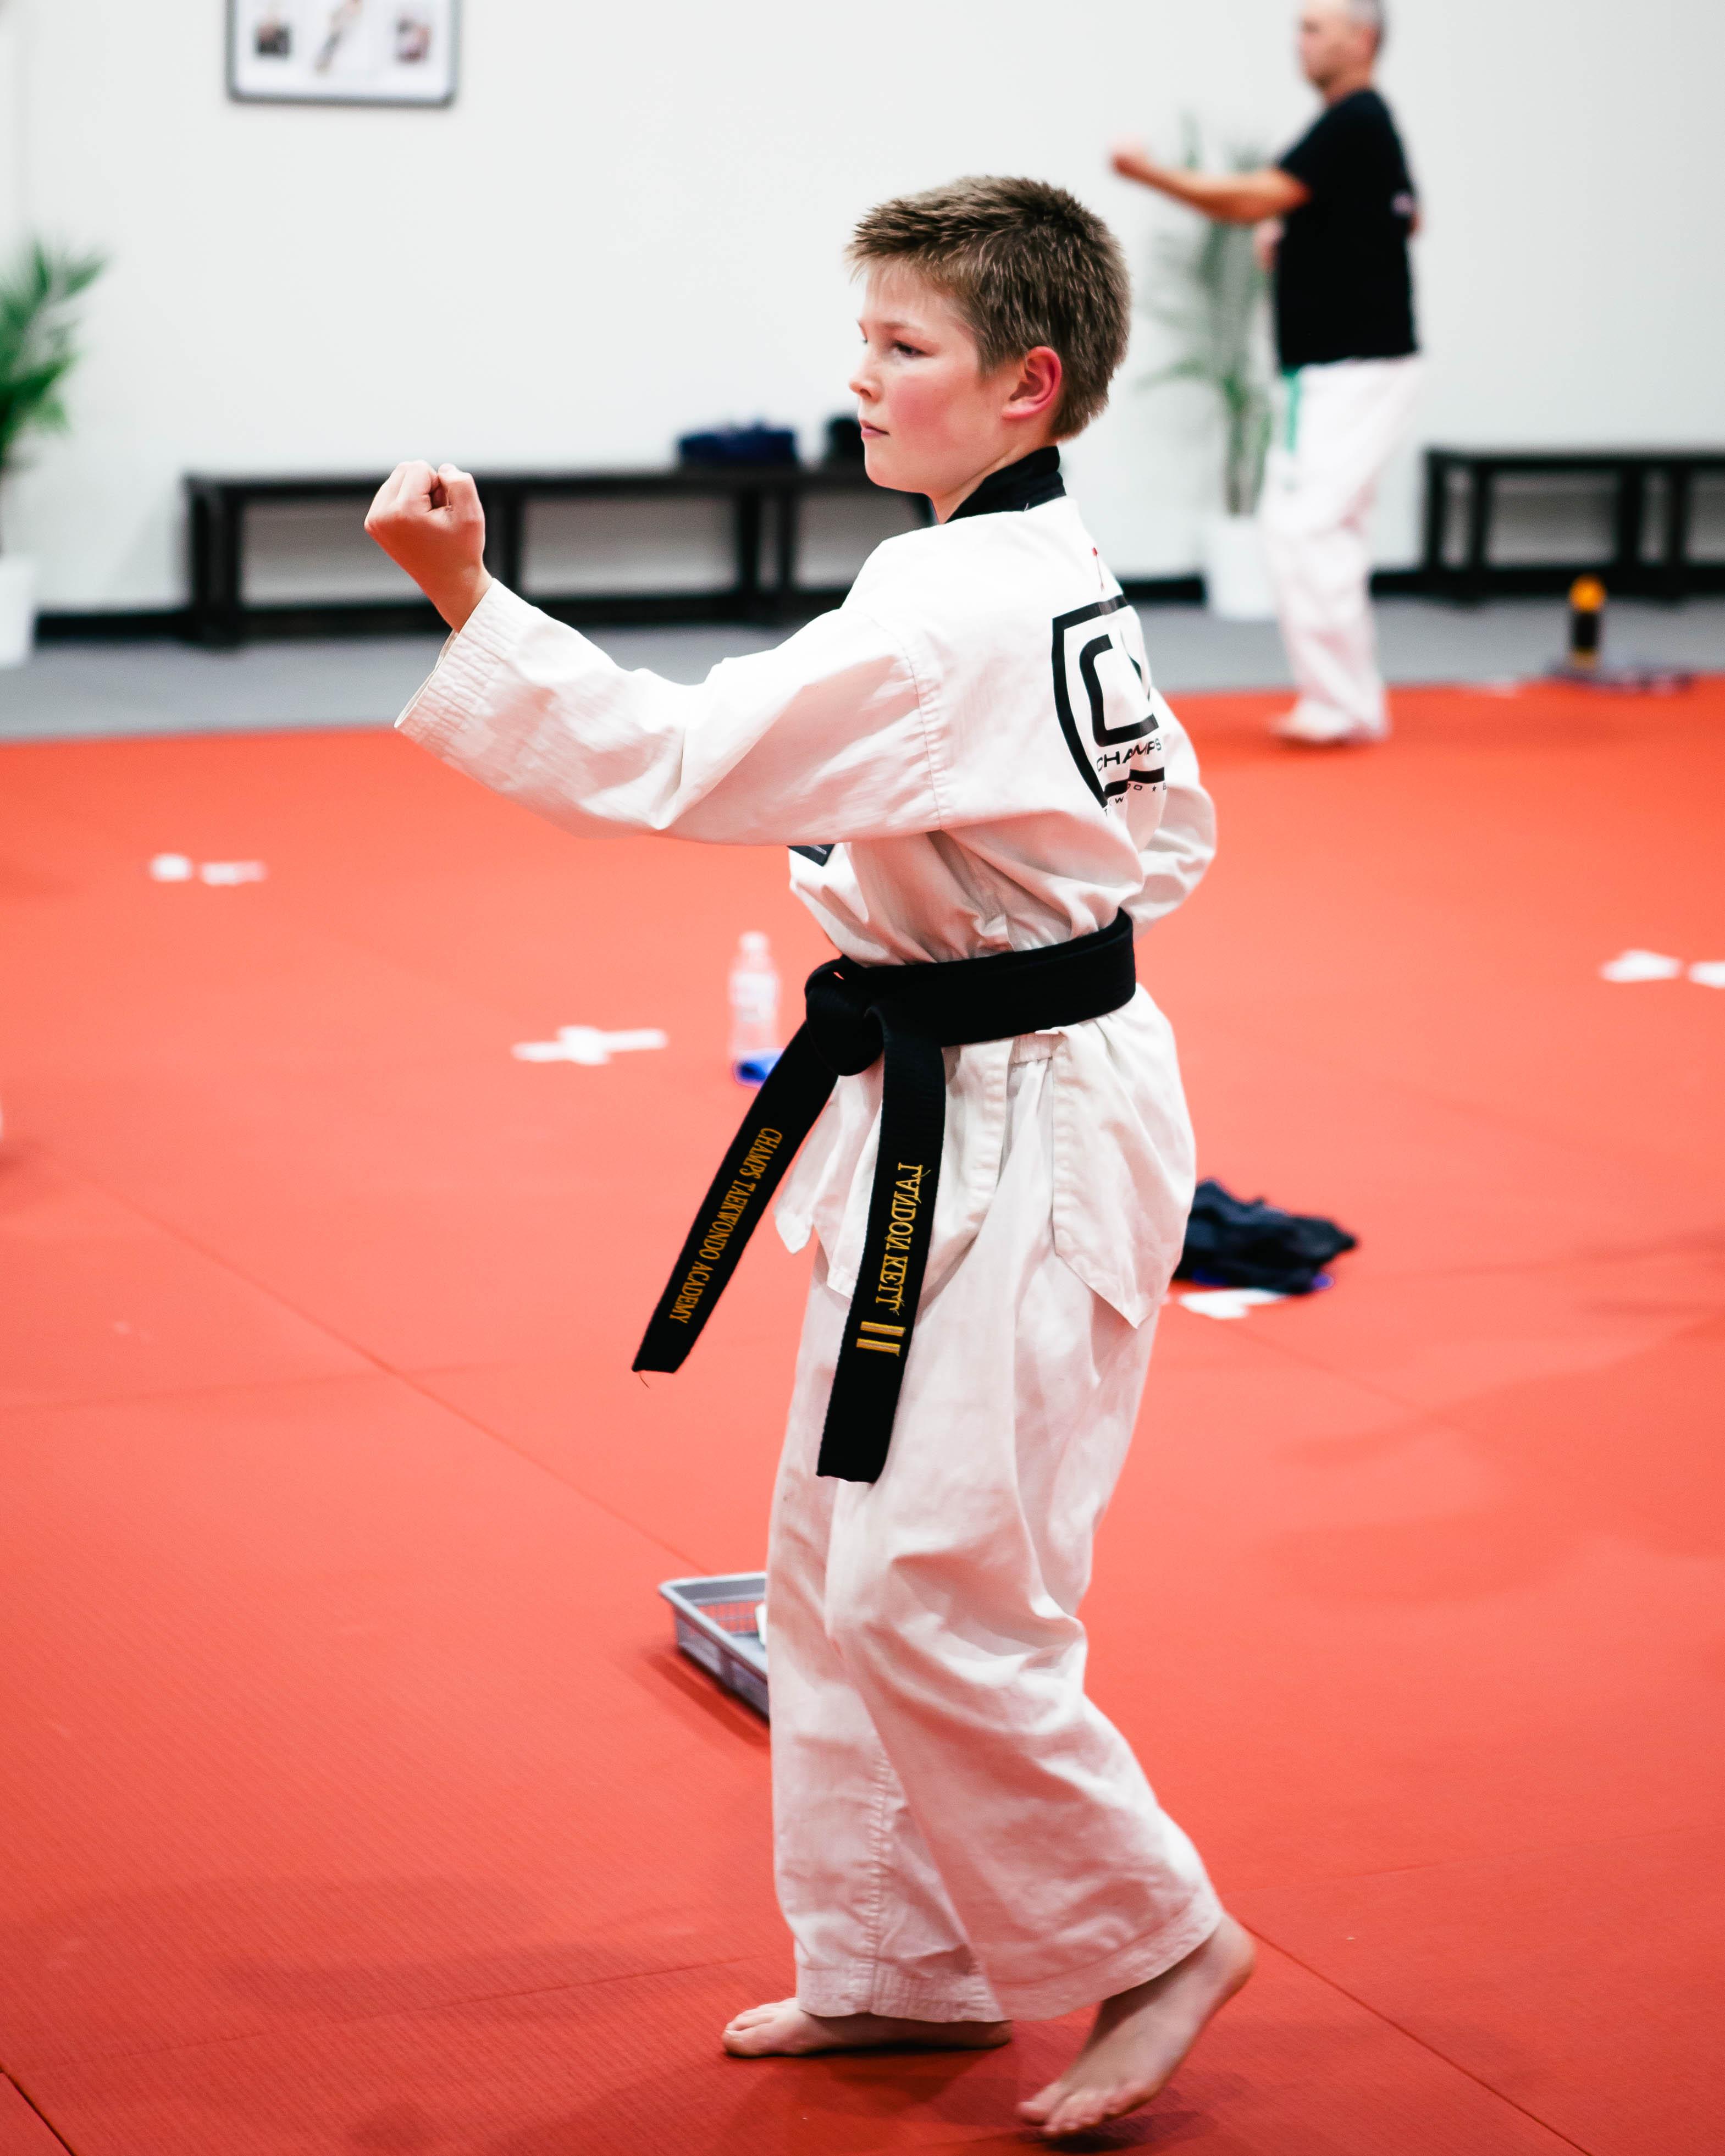 A kid practicing Taekwondo